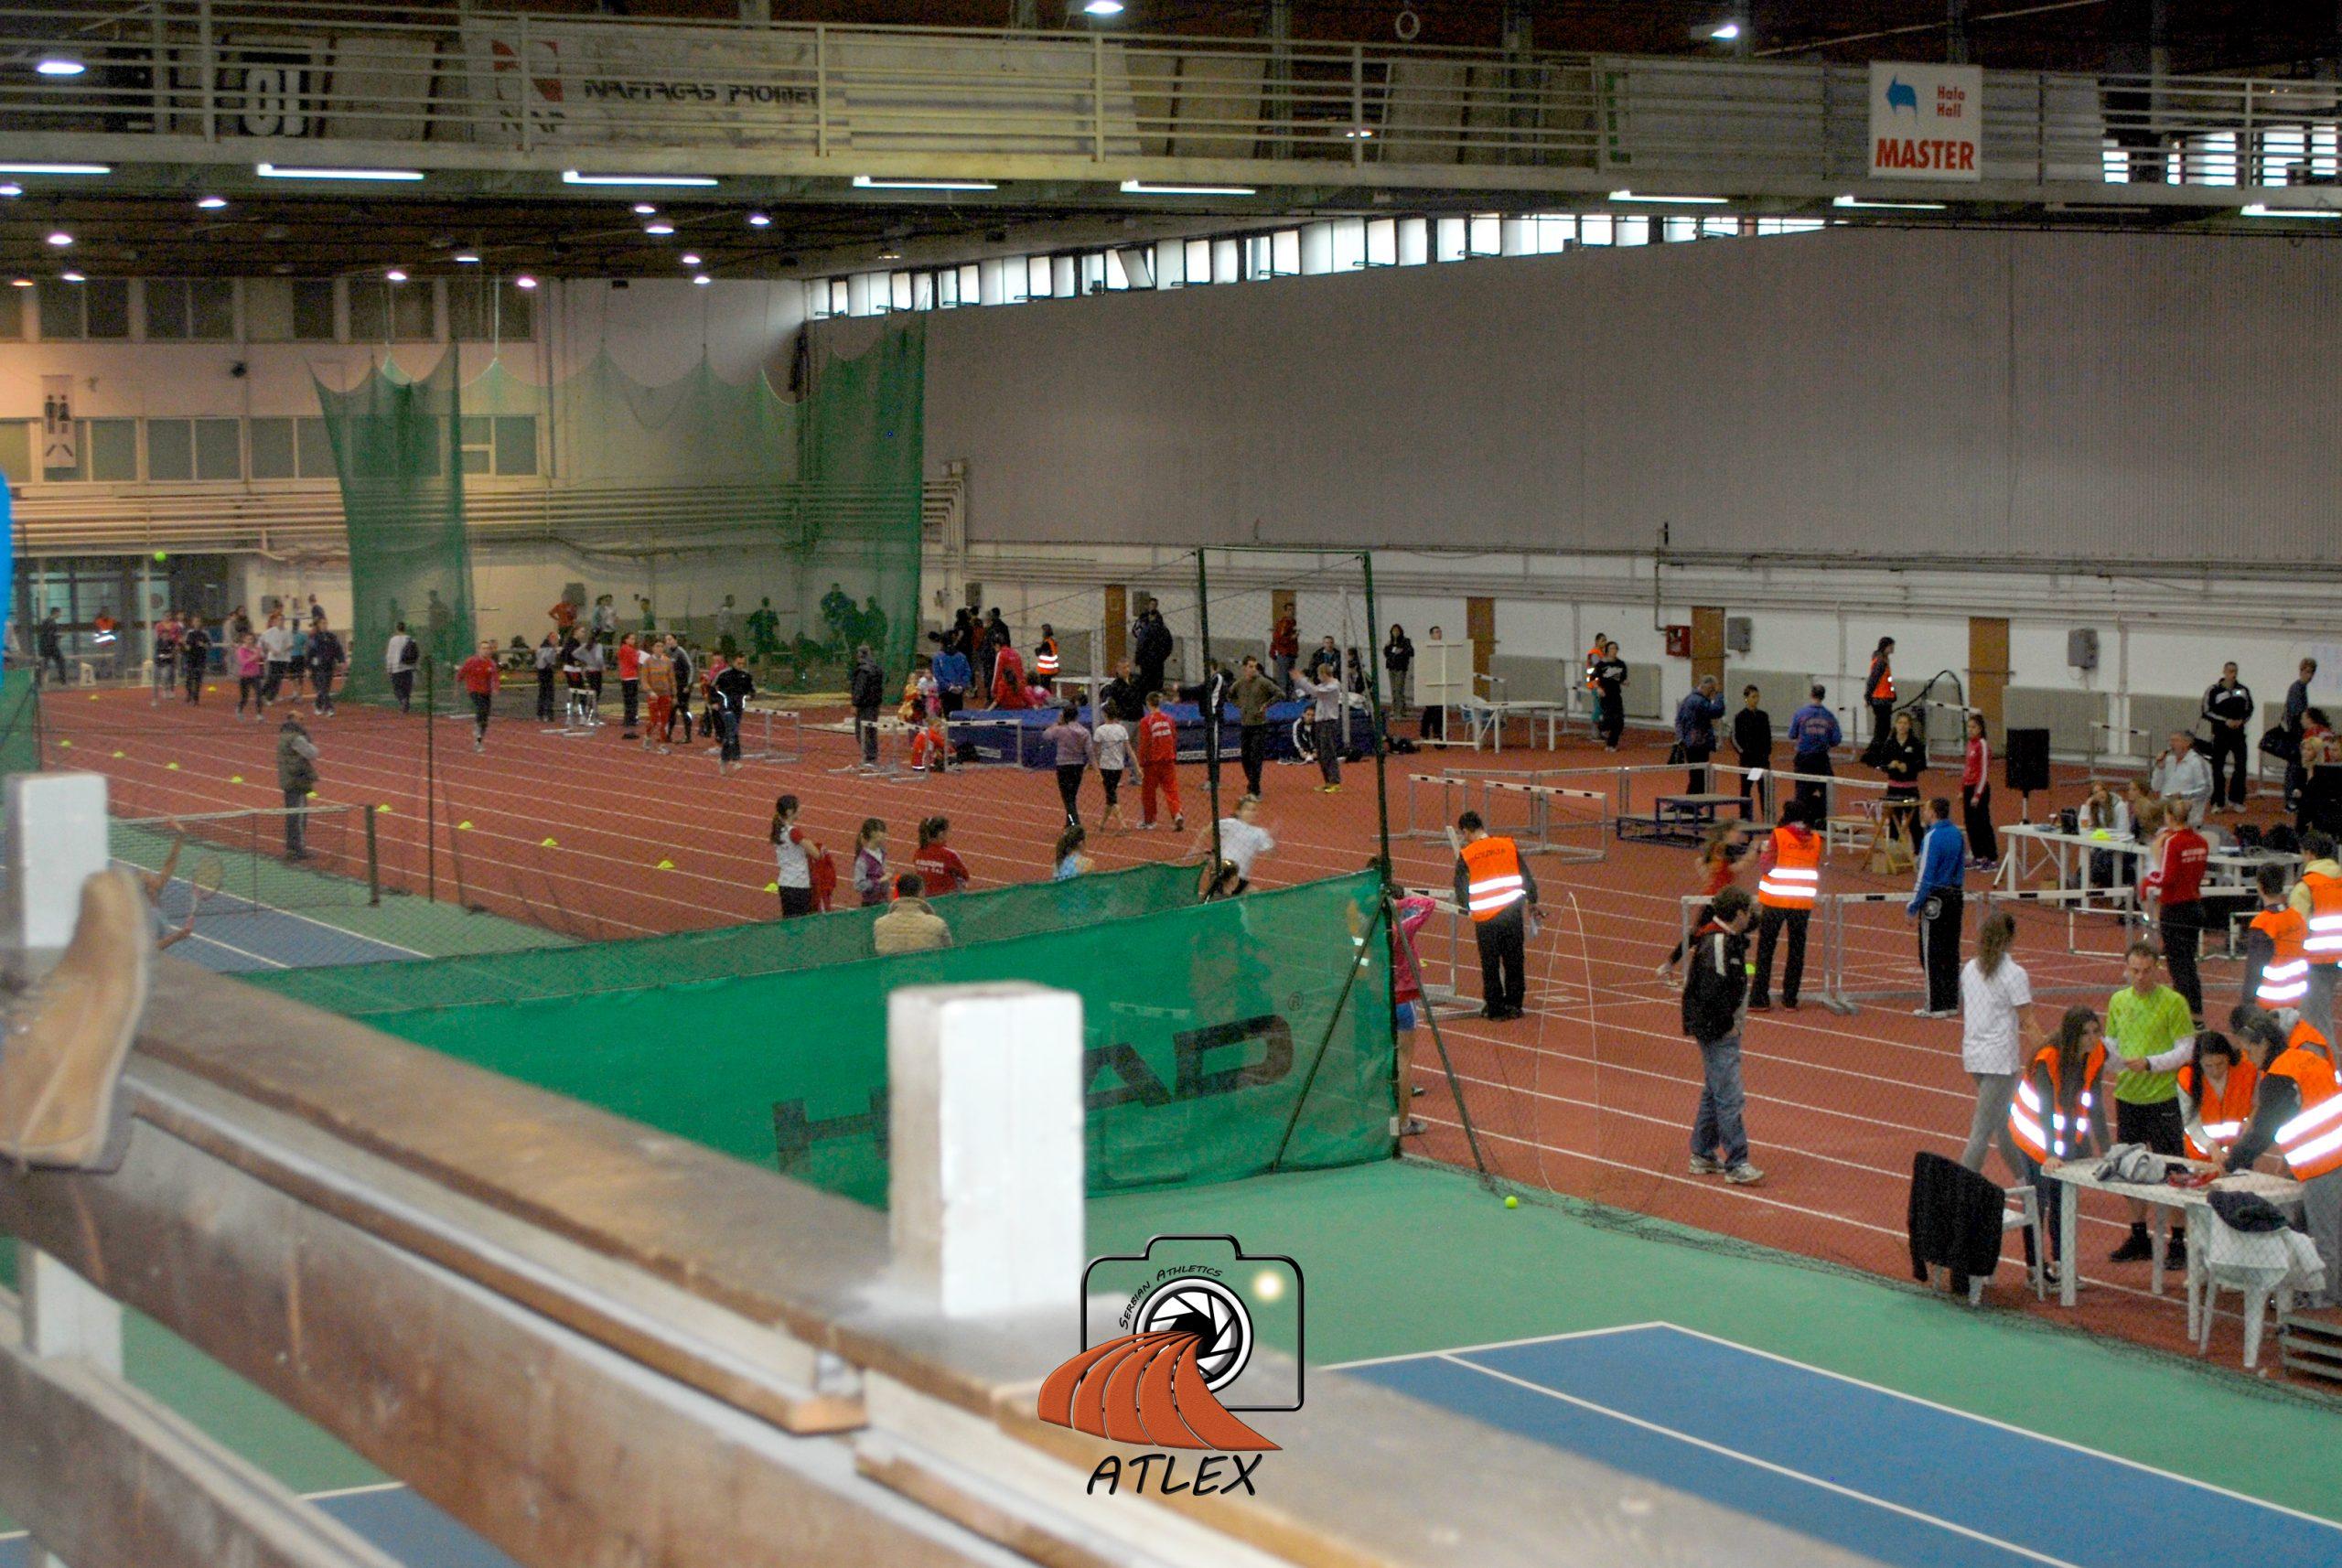 Novosadski sajam, hala 1, atletika indoor